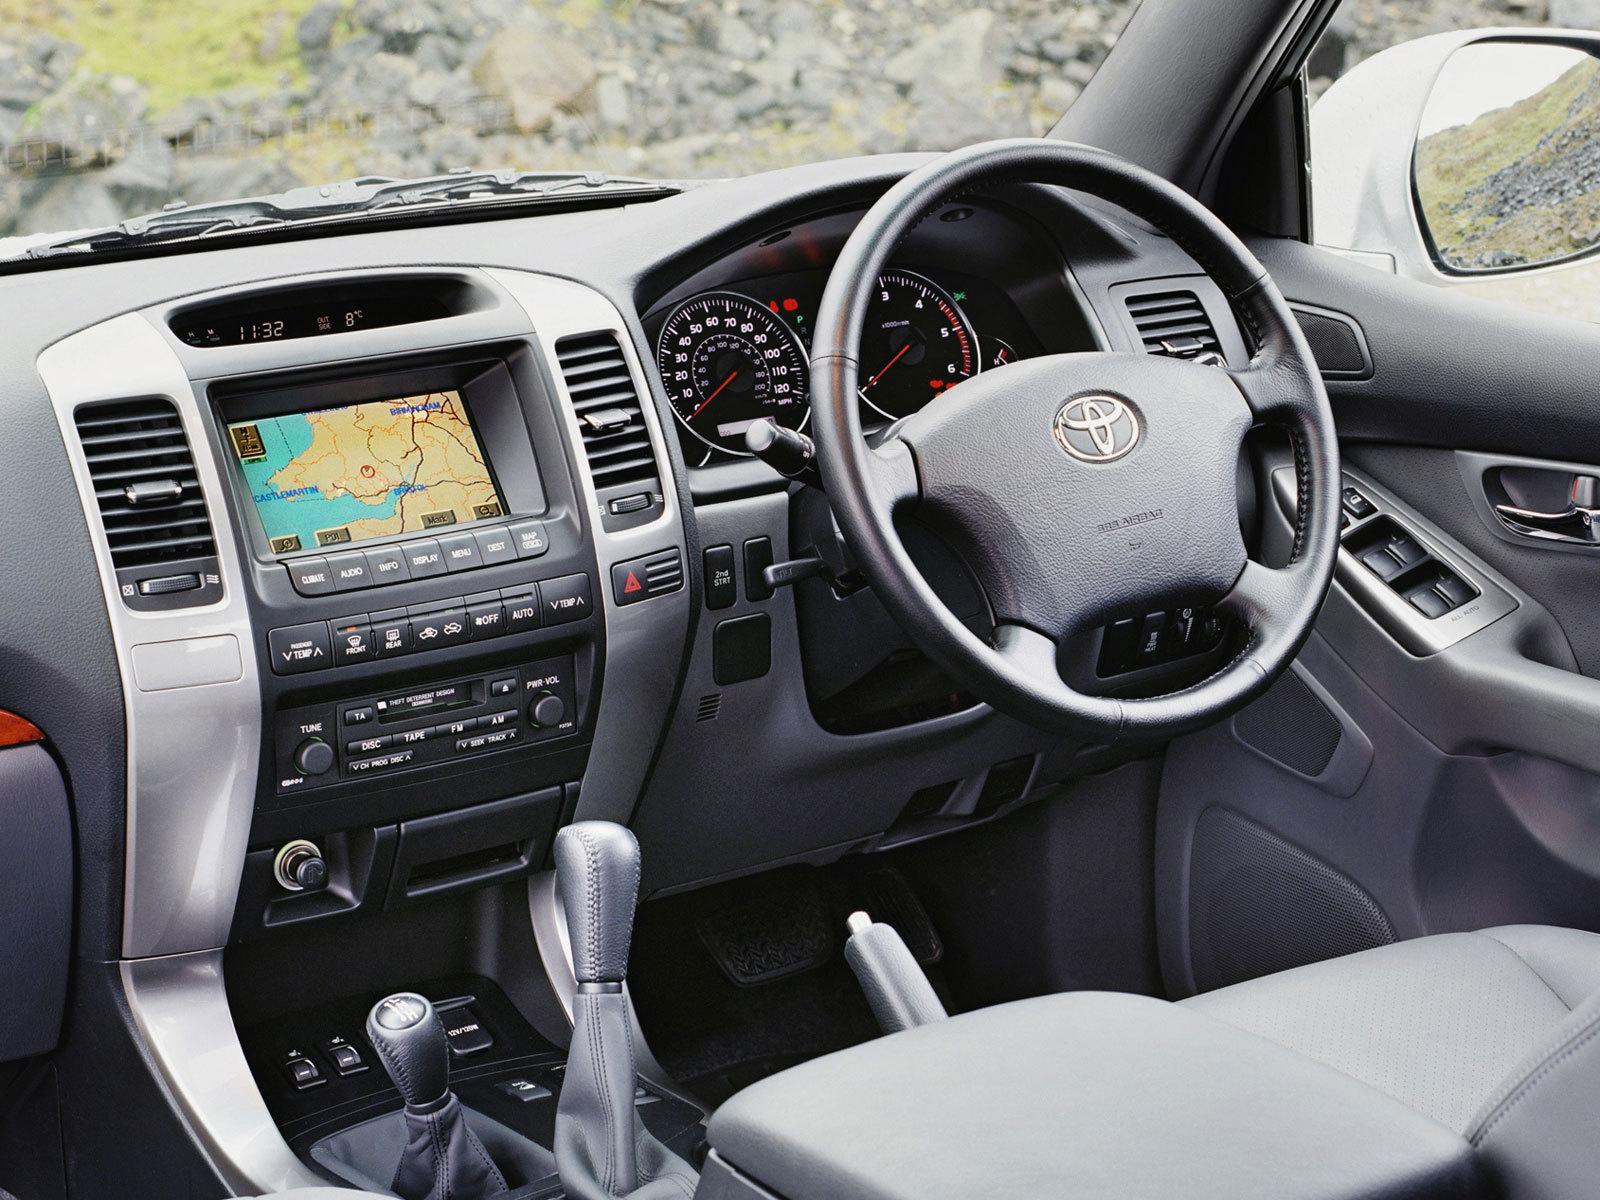 Toyota Land Cruiser Prado Tires And Wheels For Toyota Land Cruiser Prado Prices And Reviews